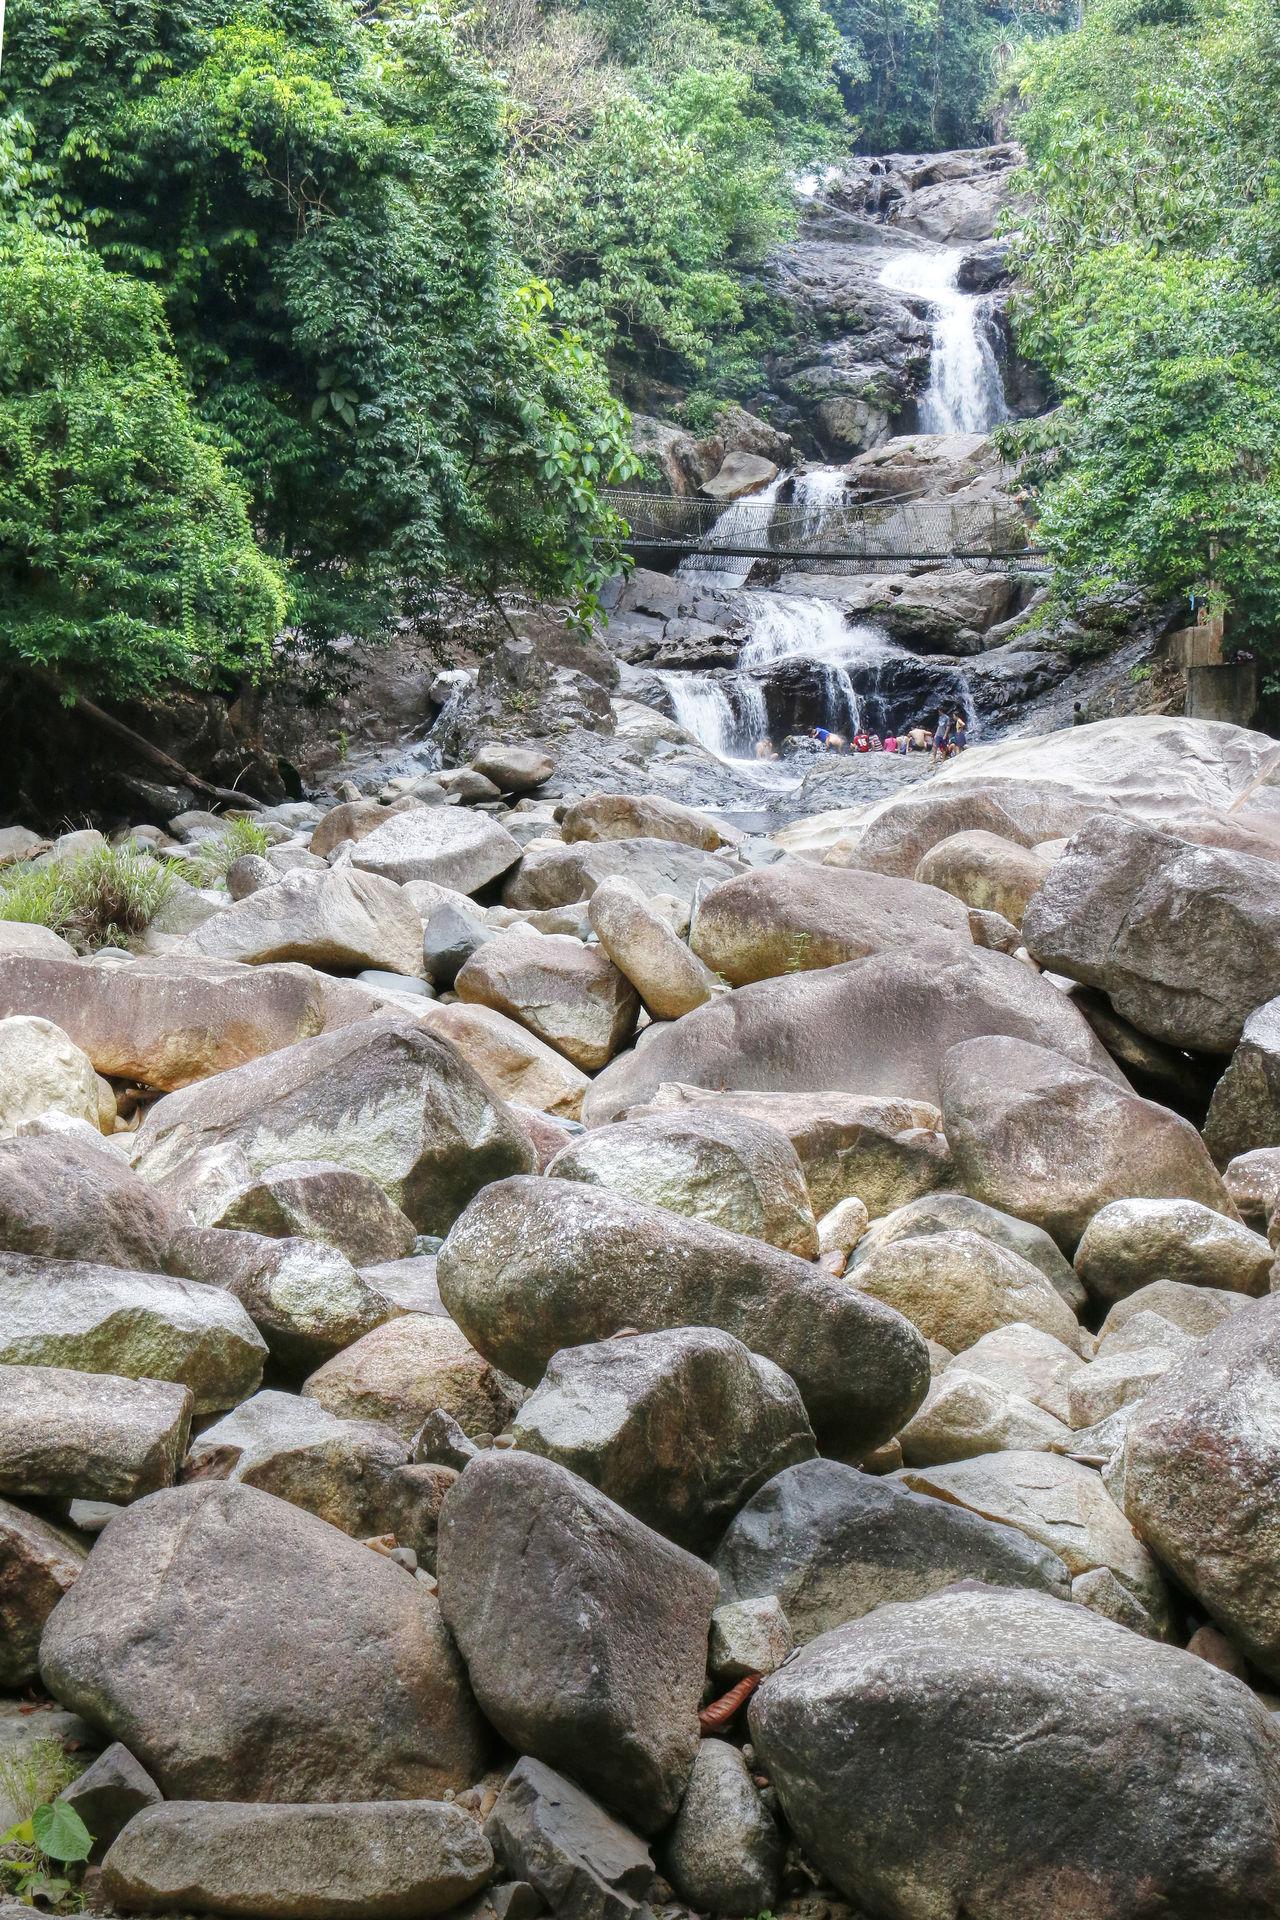 Bathing Fun Having Fun Kenyir Kenyir Lake Malaysia Nature Plants Refreshing Rocks Stream Swim Swimming Tropical Tropical Jungle Water Waterfall Wildlife & Nature